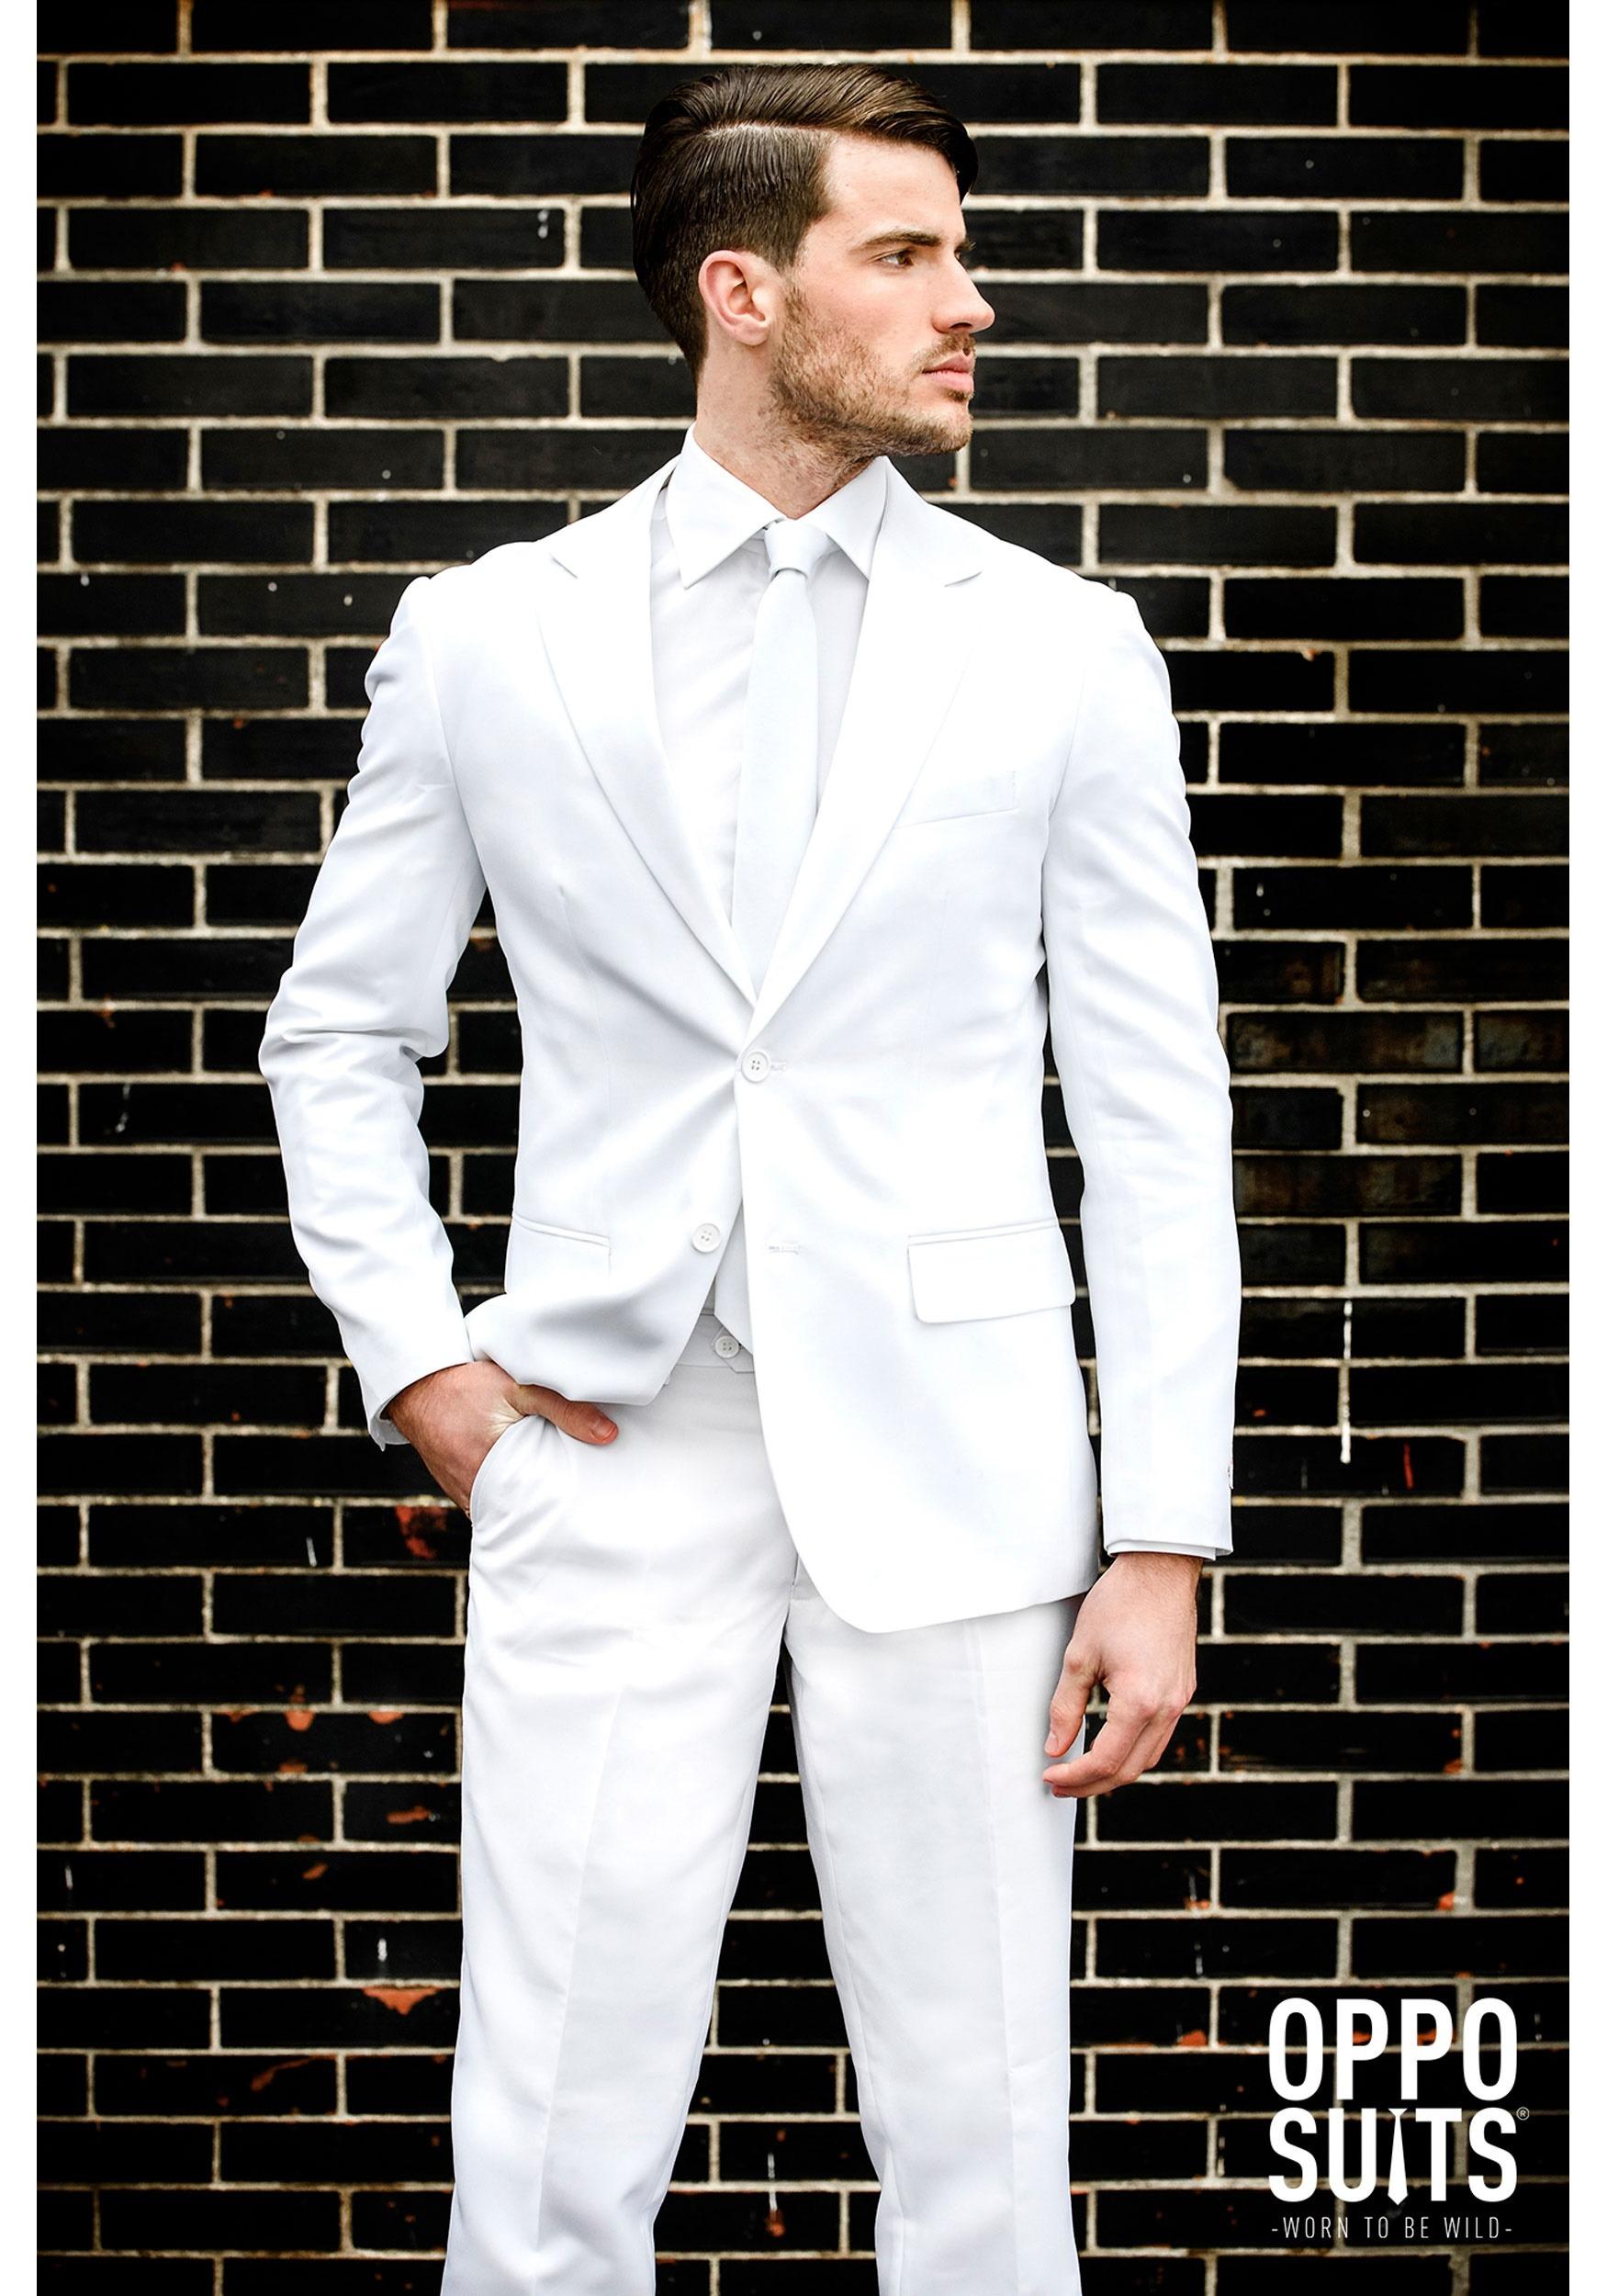 f3a3eecbdf0de Opposuits White Knight Suit for Men